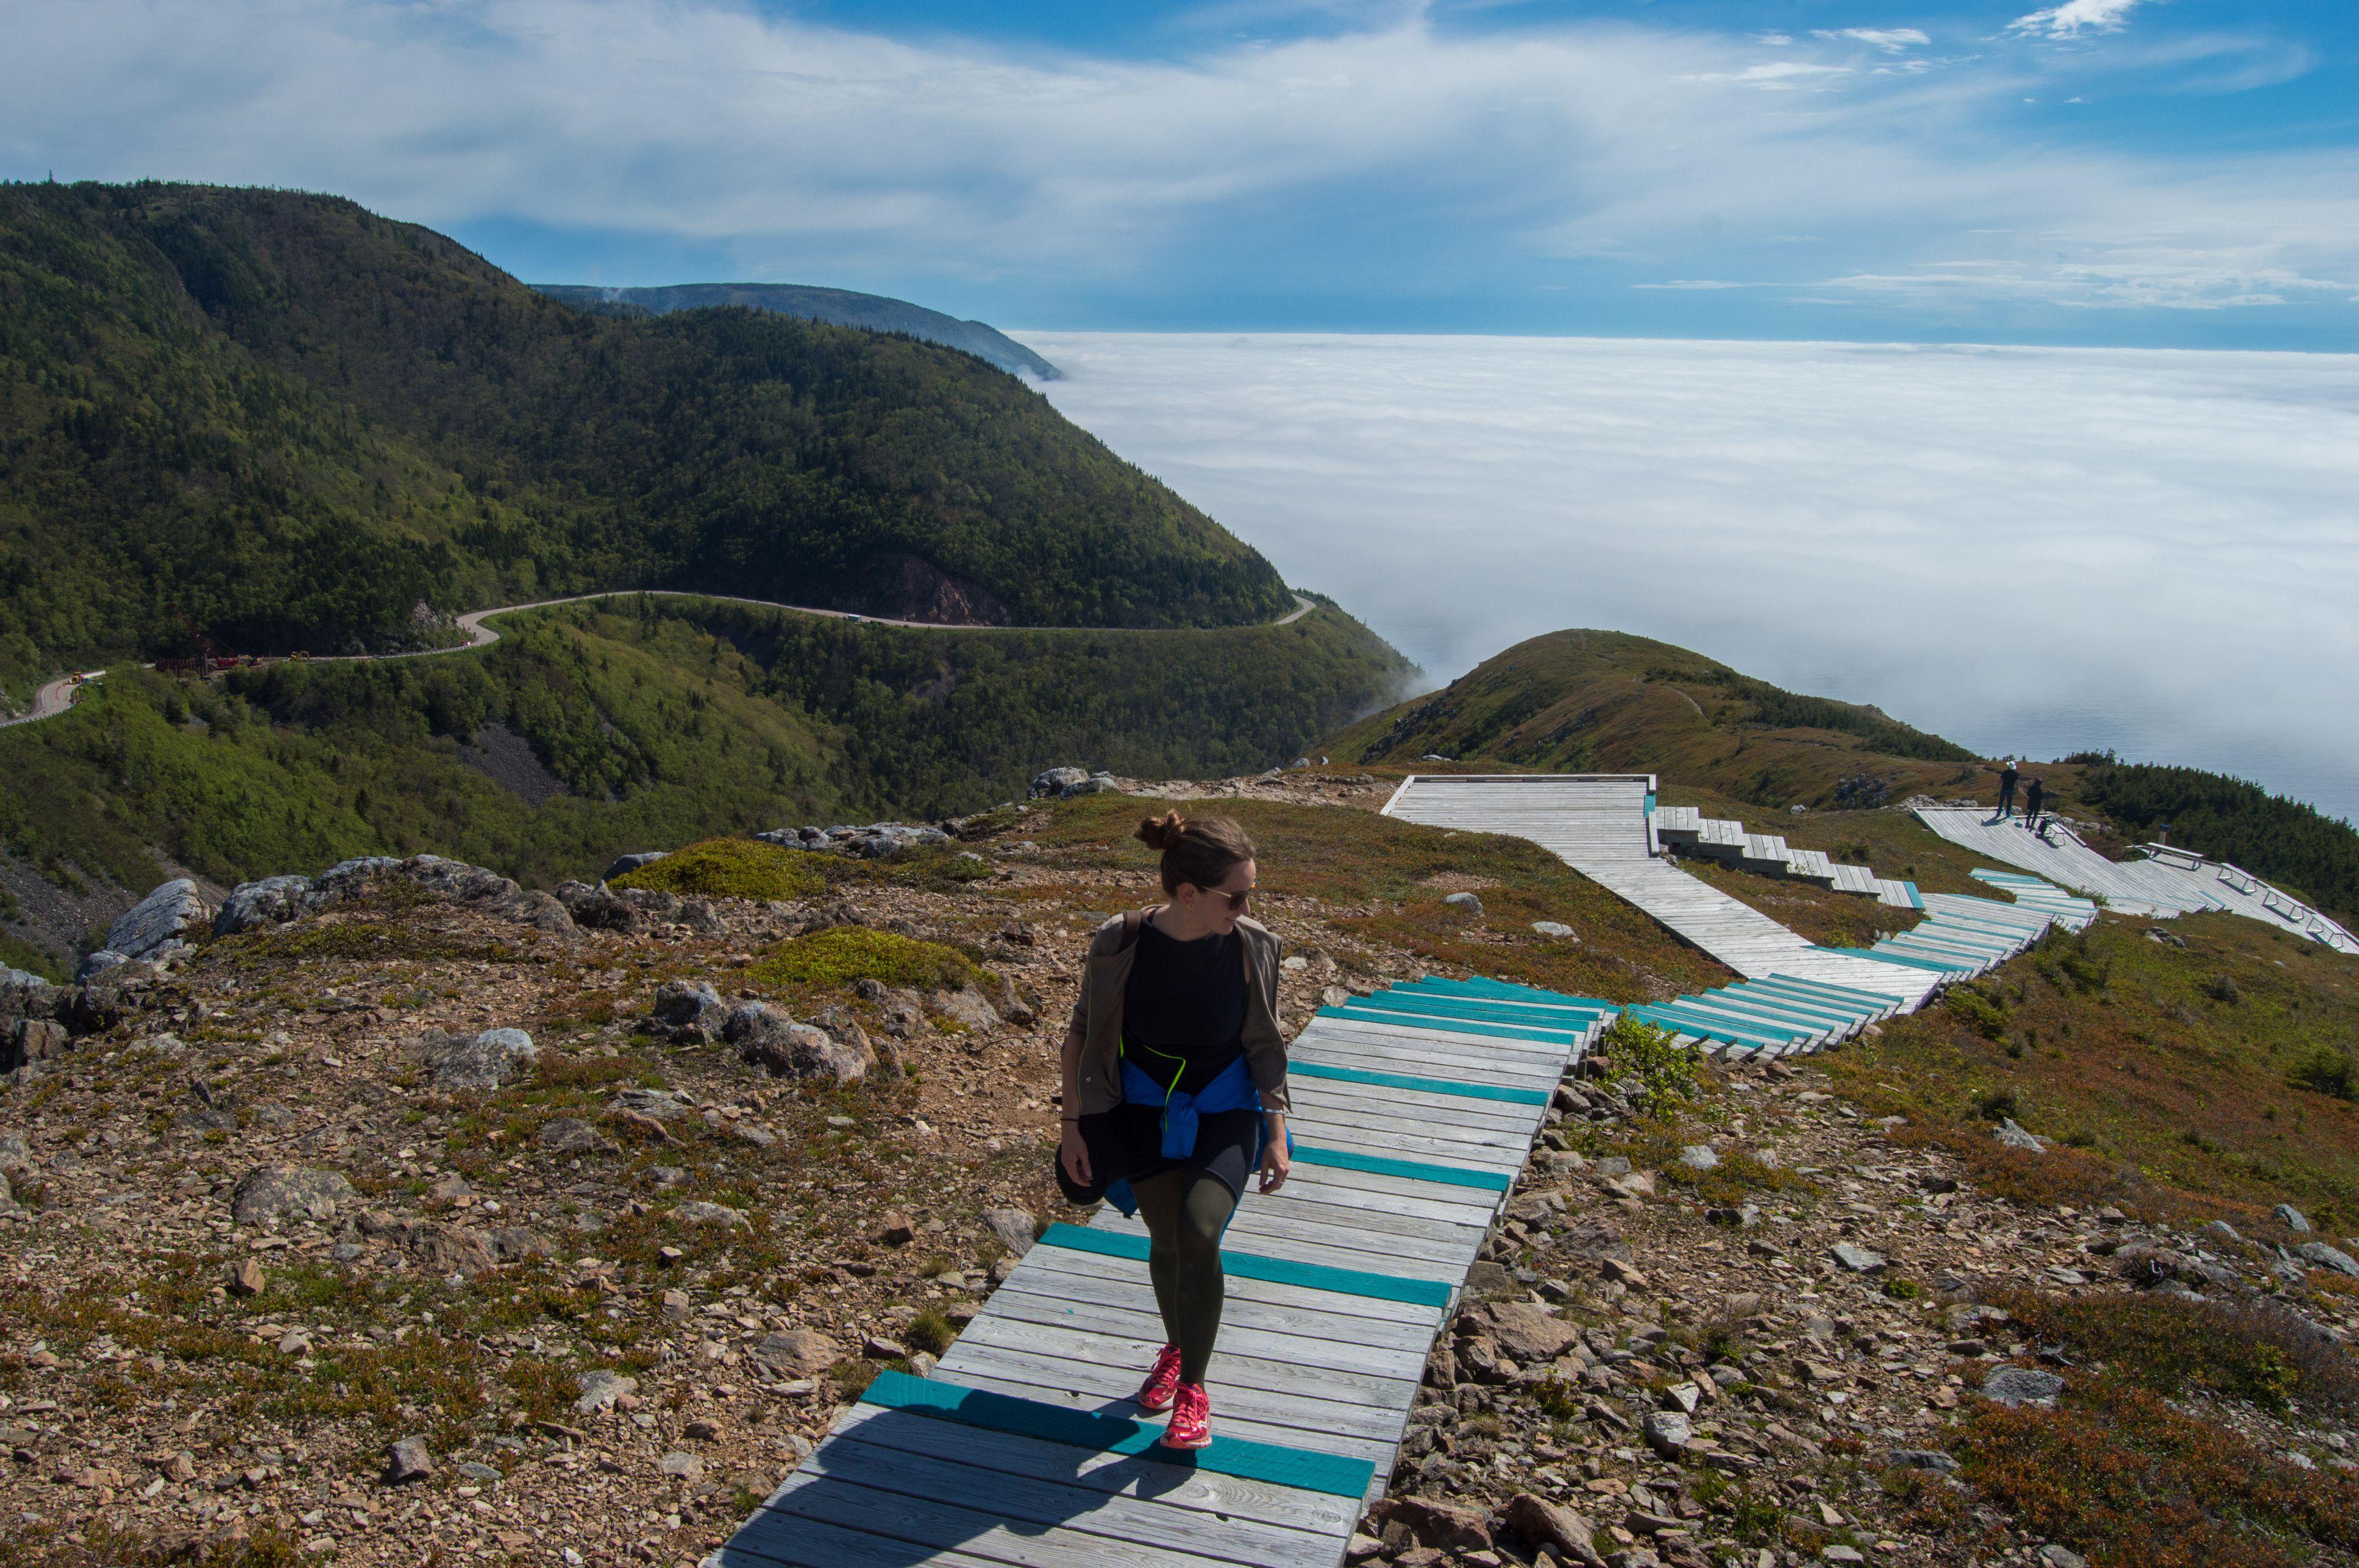 Full Length Of Female Hiker Walking On Steps At Cabot Trail